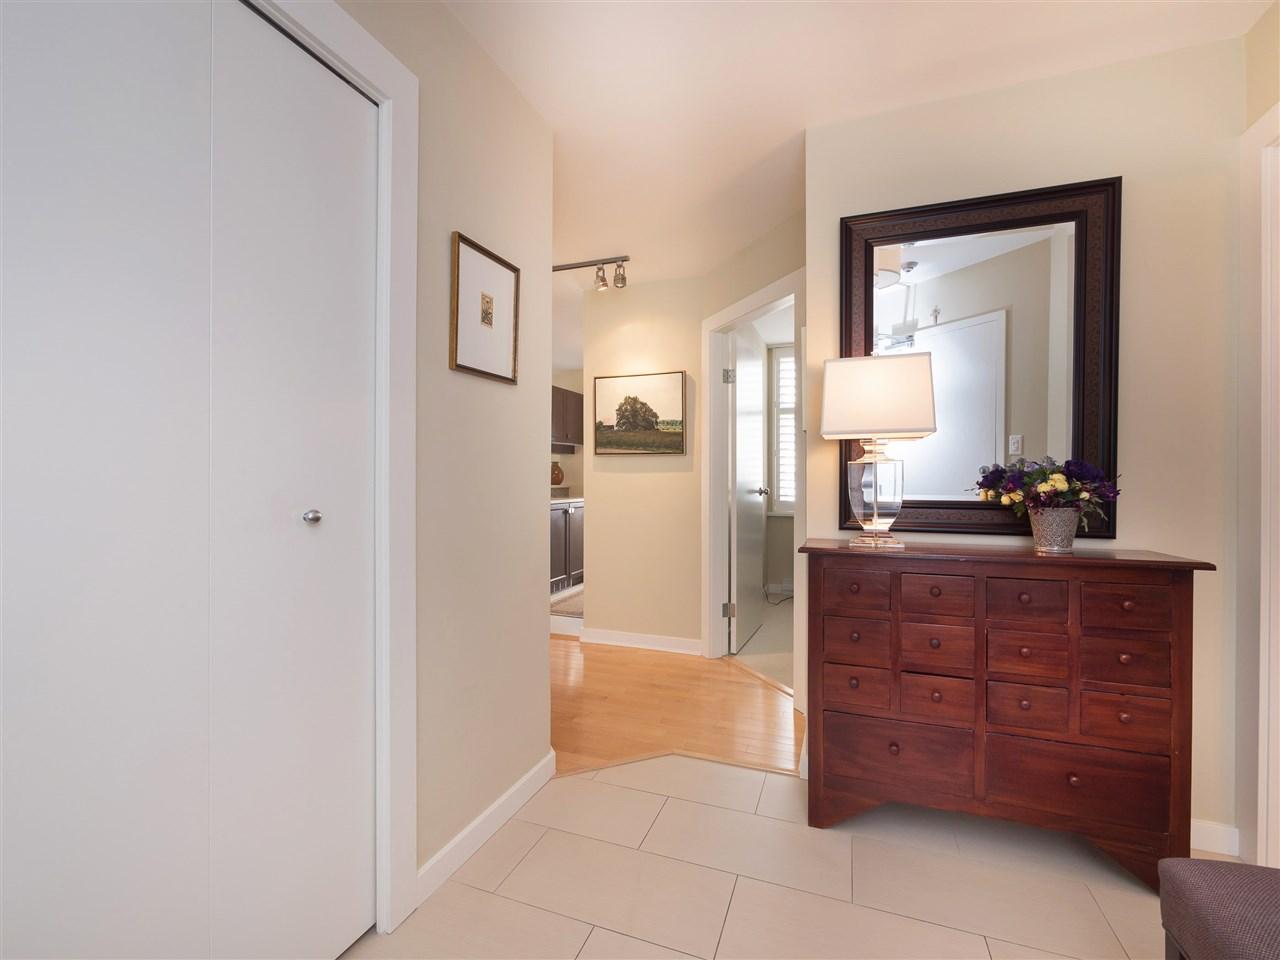 Condo Apartment at 303 1436 HARWOOD STREET, Unit 303, Vancouver West, British Columbia. Image 10